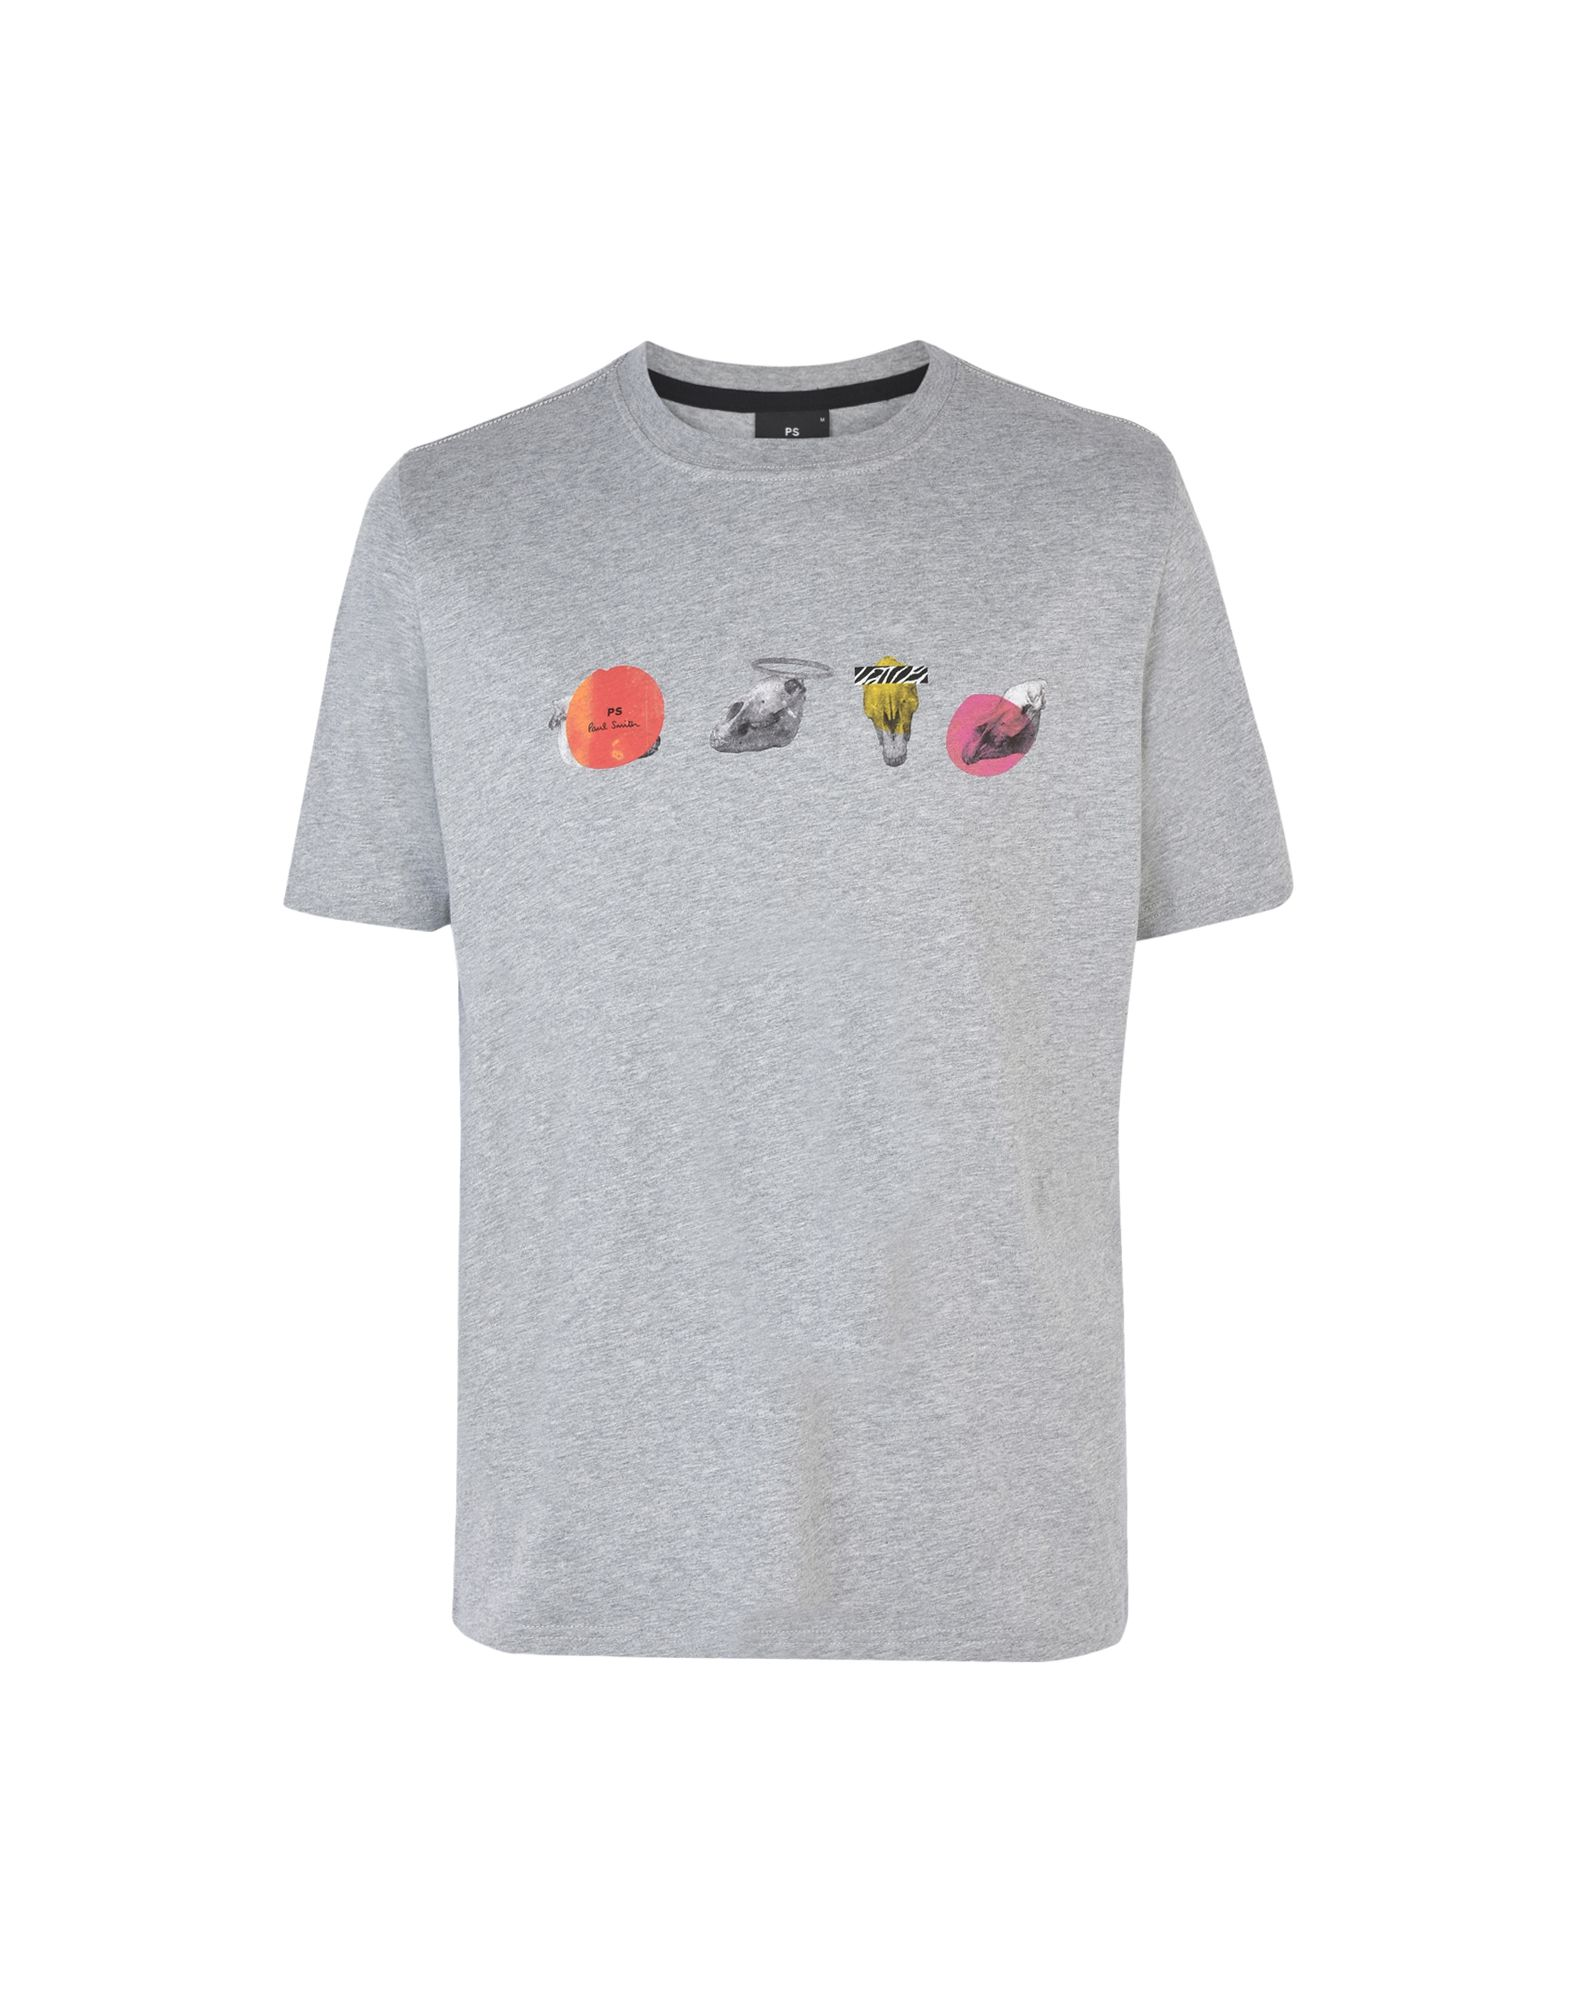 a60aa4bc Ps Paul Smith Mens Ss Reg T-Shirt Zeb Skulls - T-Shirt - Men Ps Paul Smith T -Shirts online on YOOX United States - 12154433